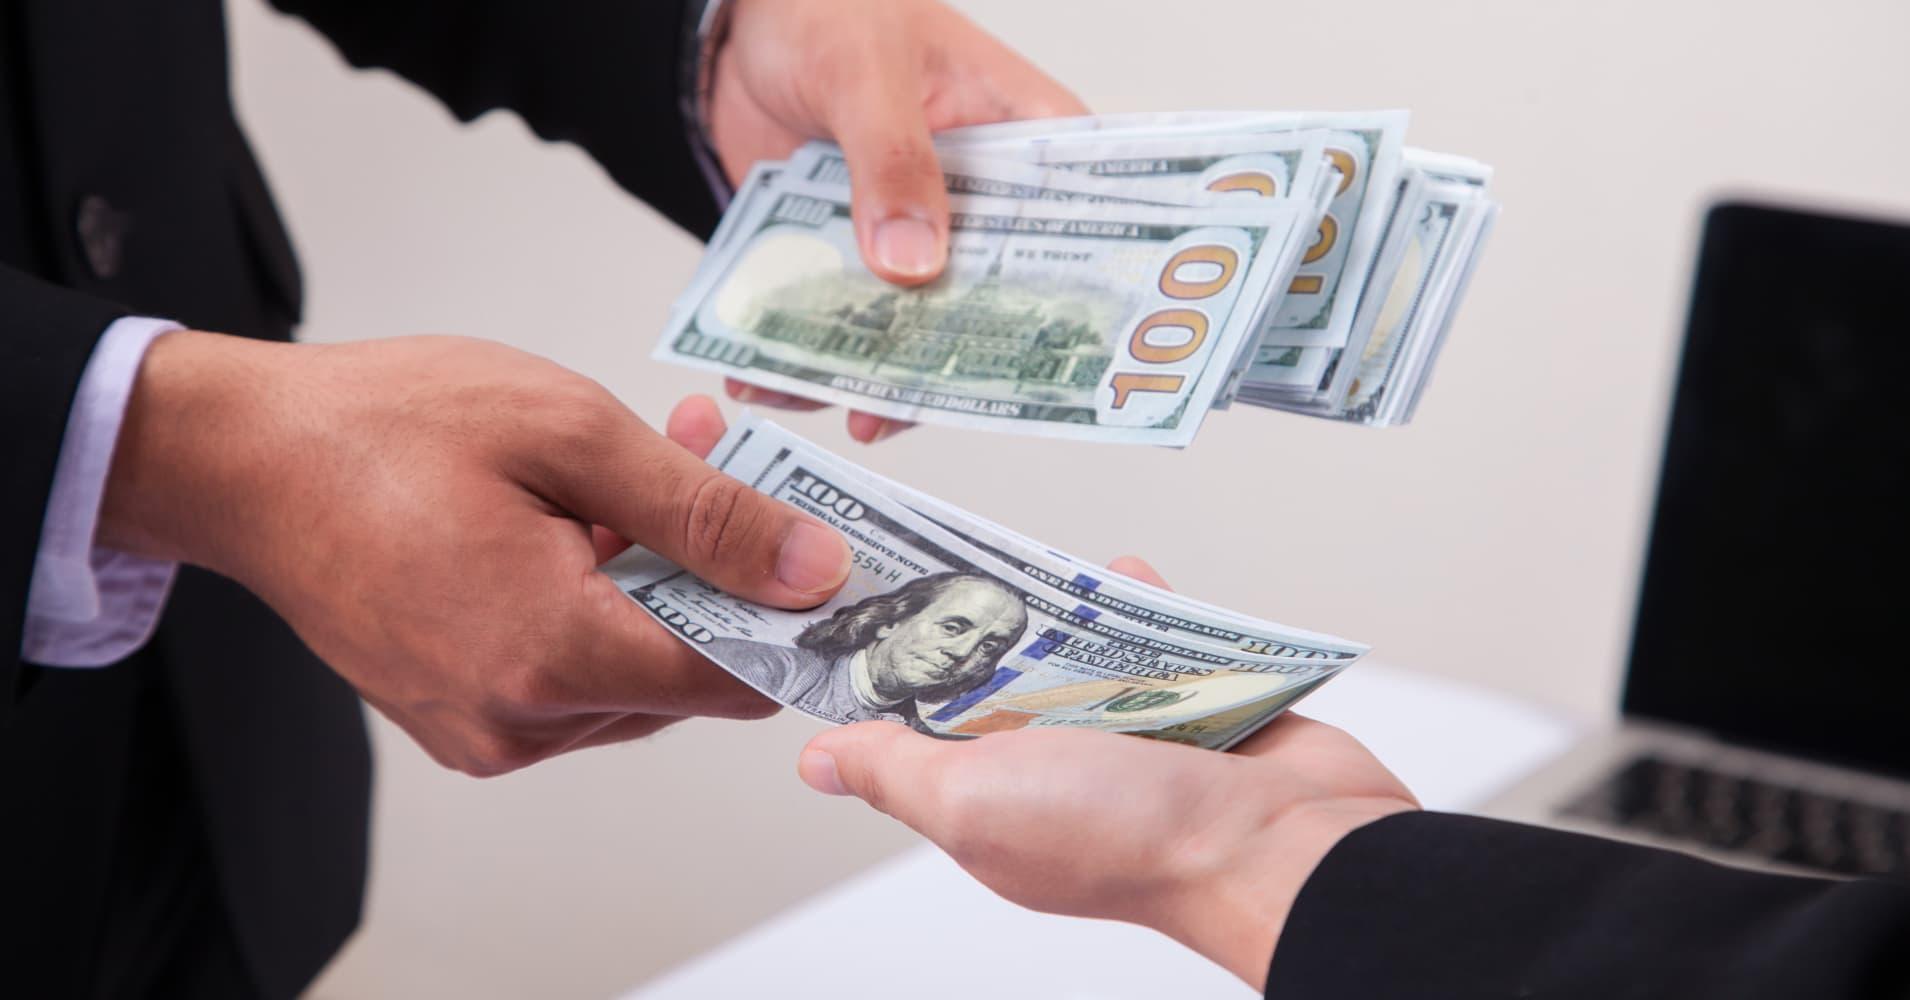 Two tax-friendly ways to donate money